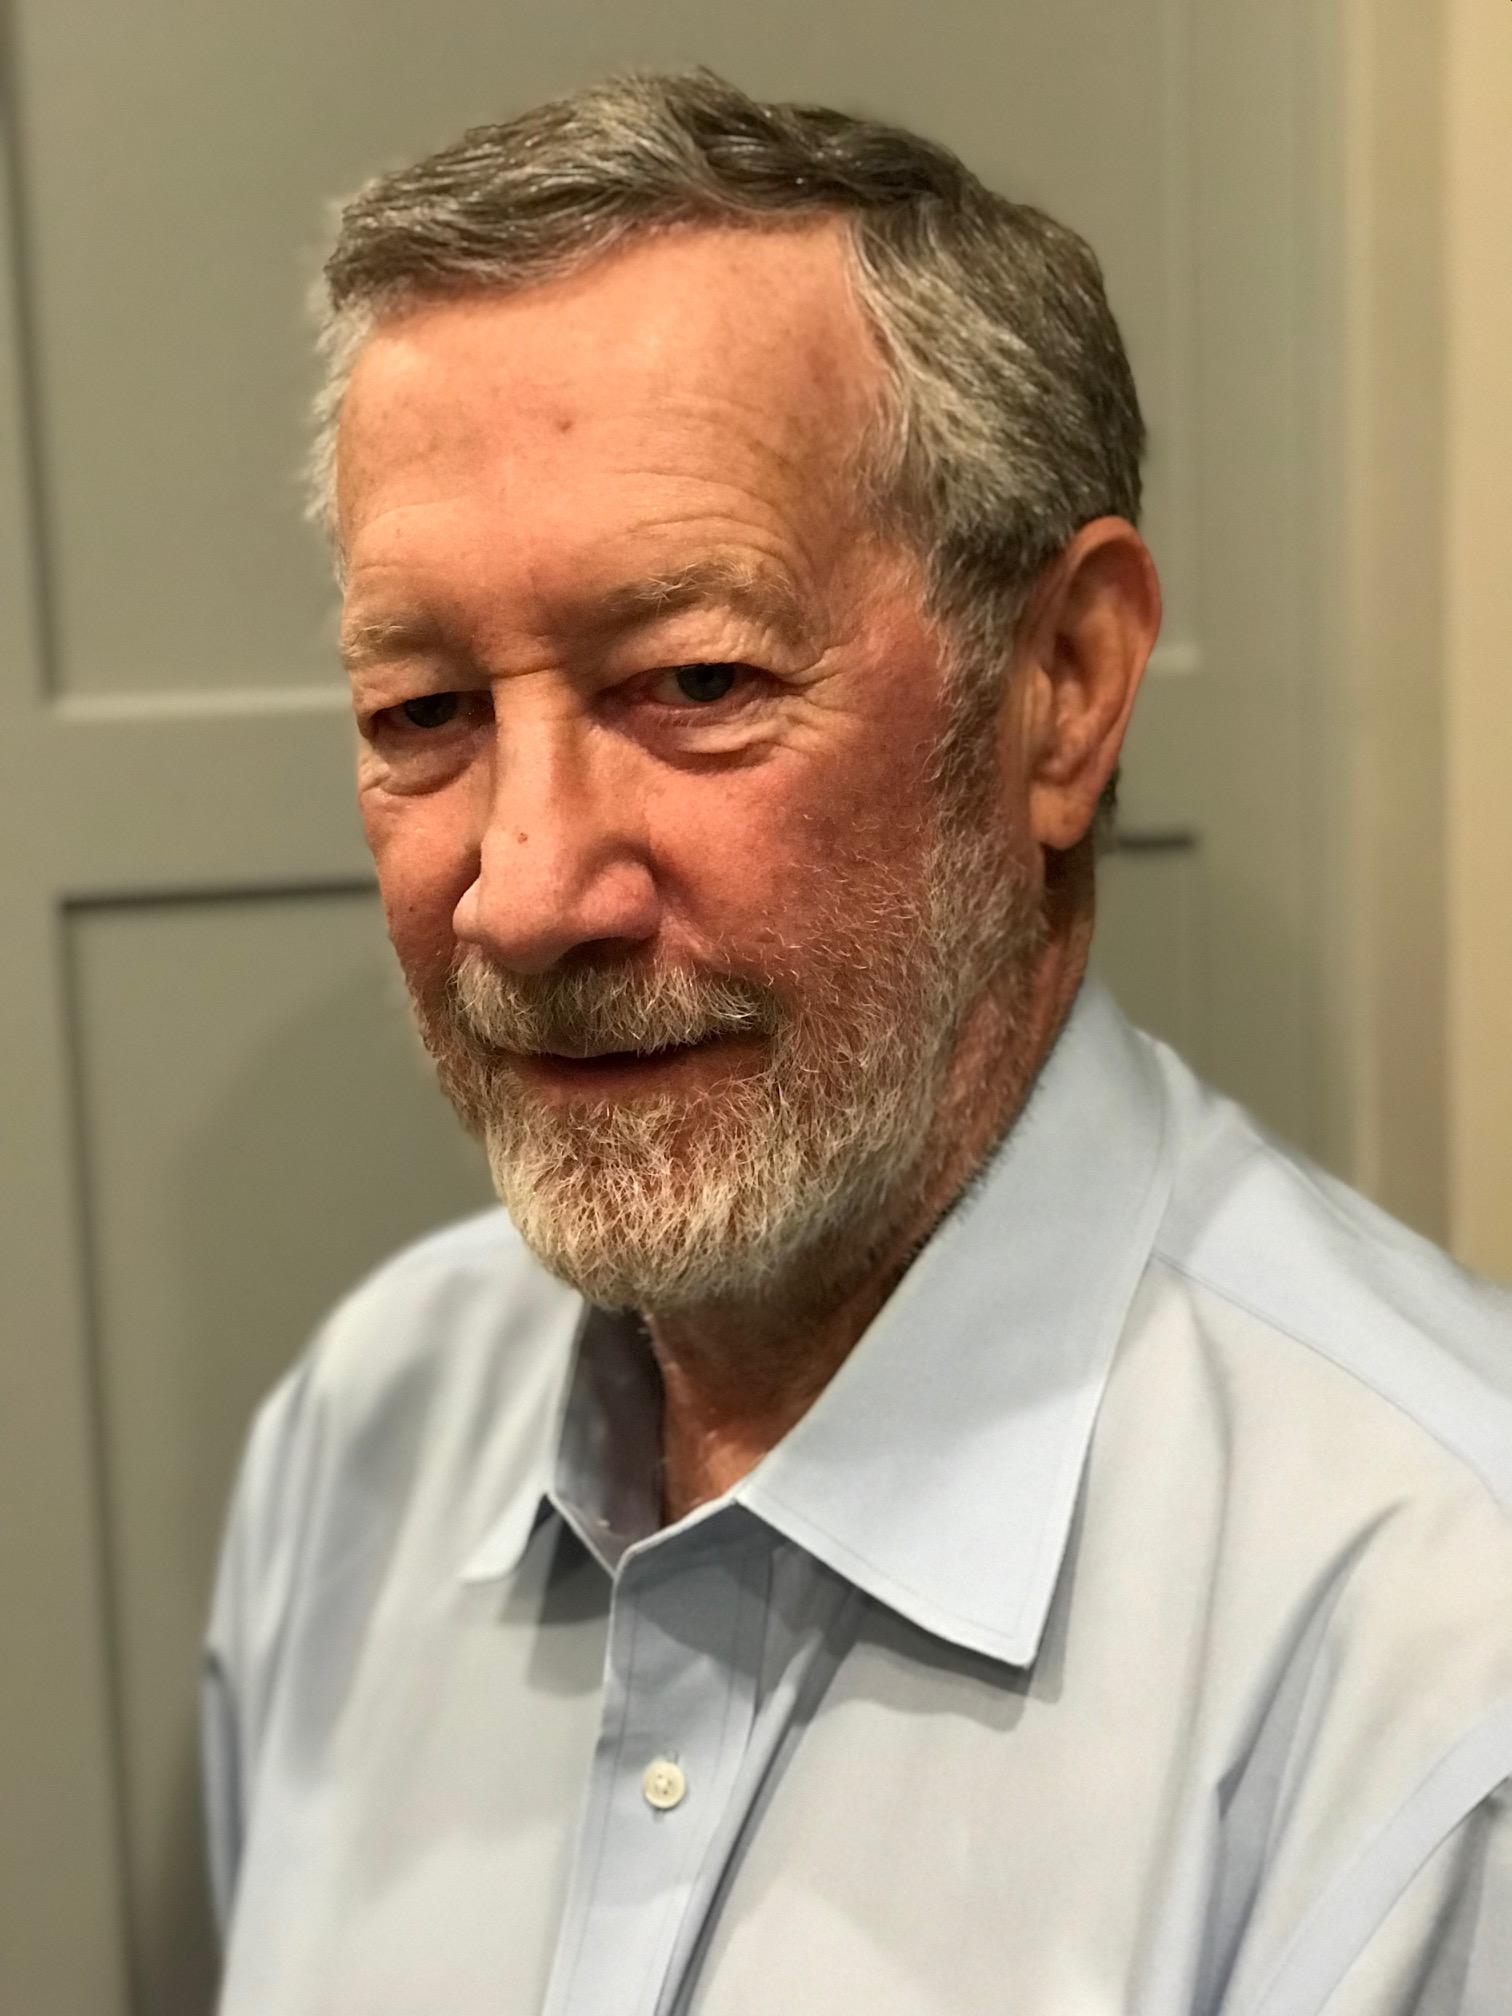 John Vratil - Community Volunteer